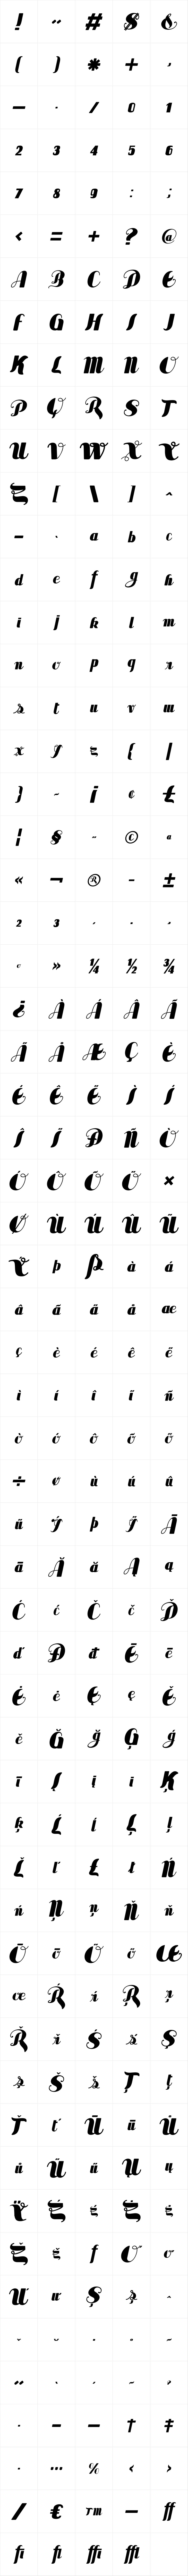 Sabor Italic